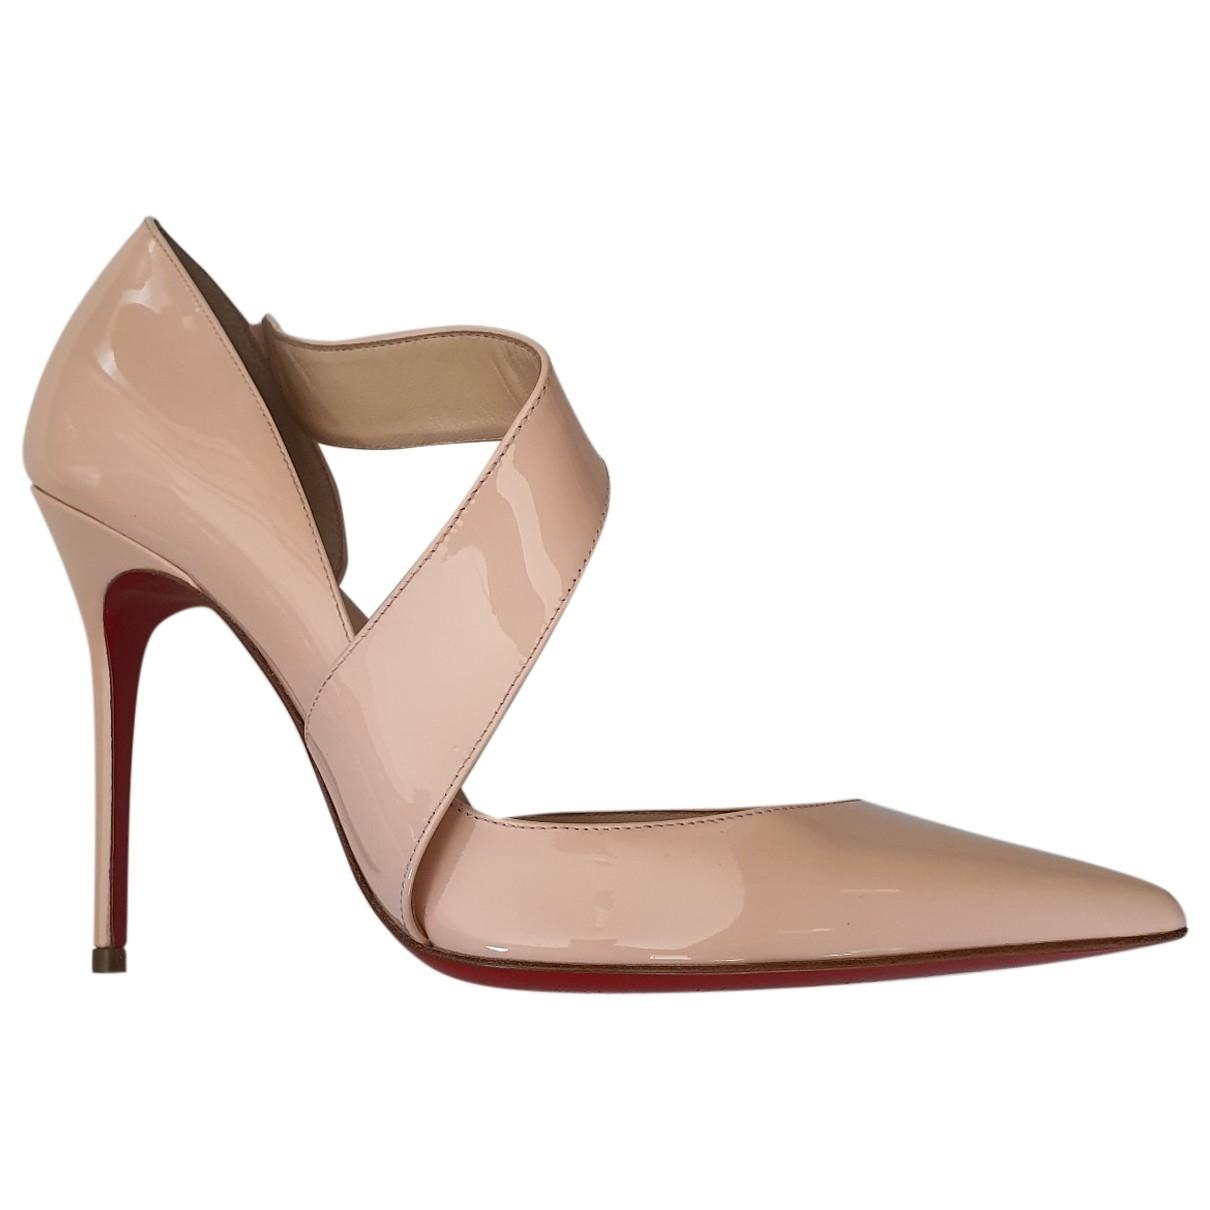 Christian Louboutin \N Pink Patent leather Heels for Women 37.5 EU